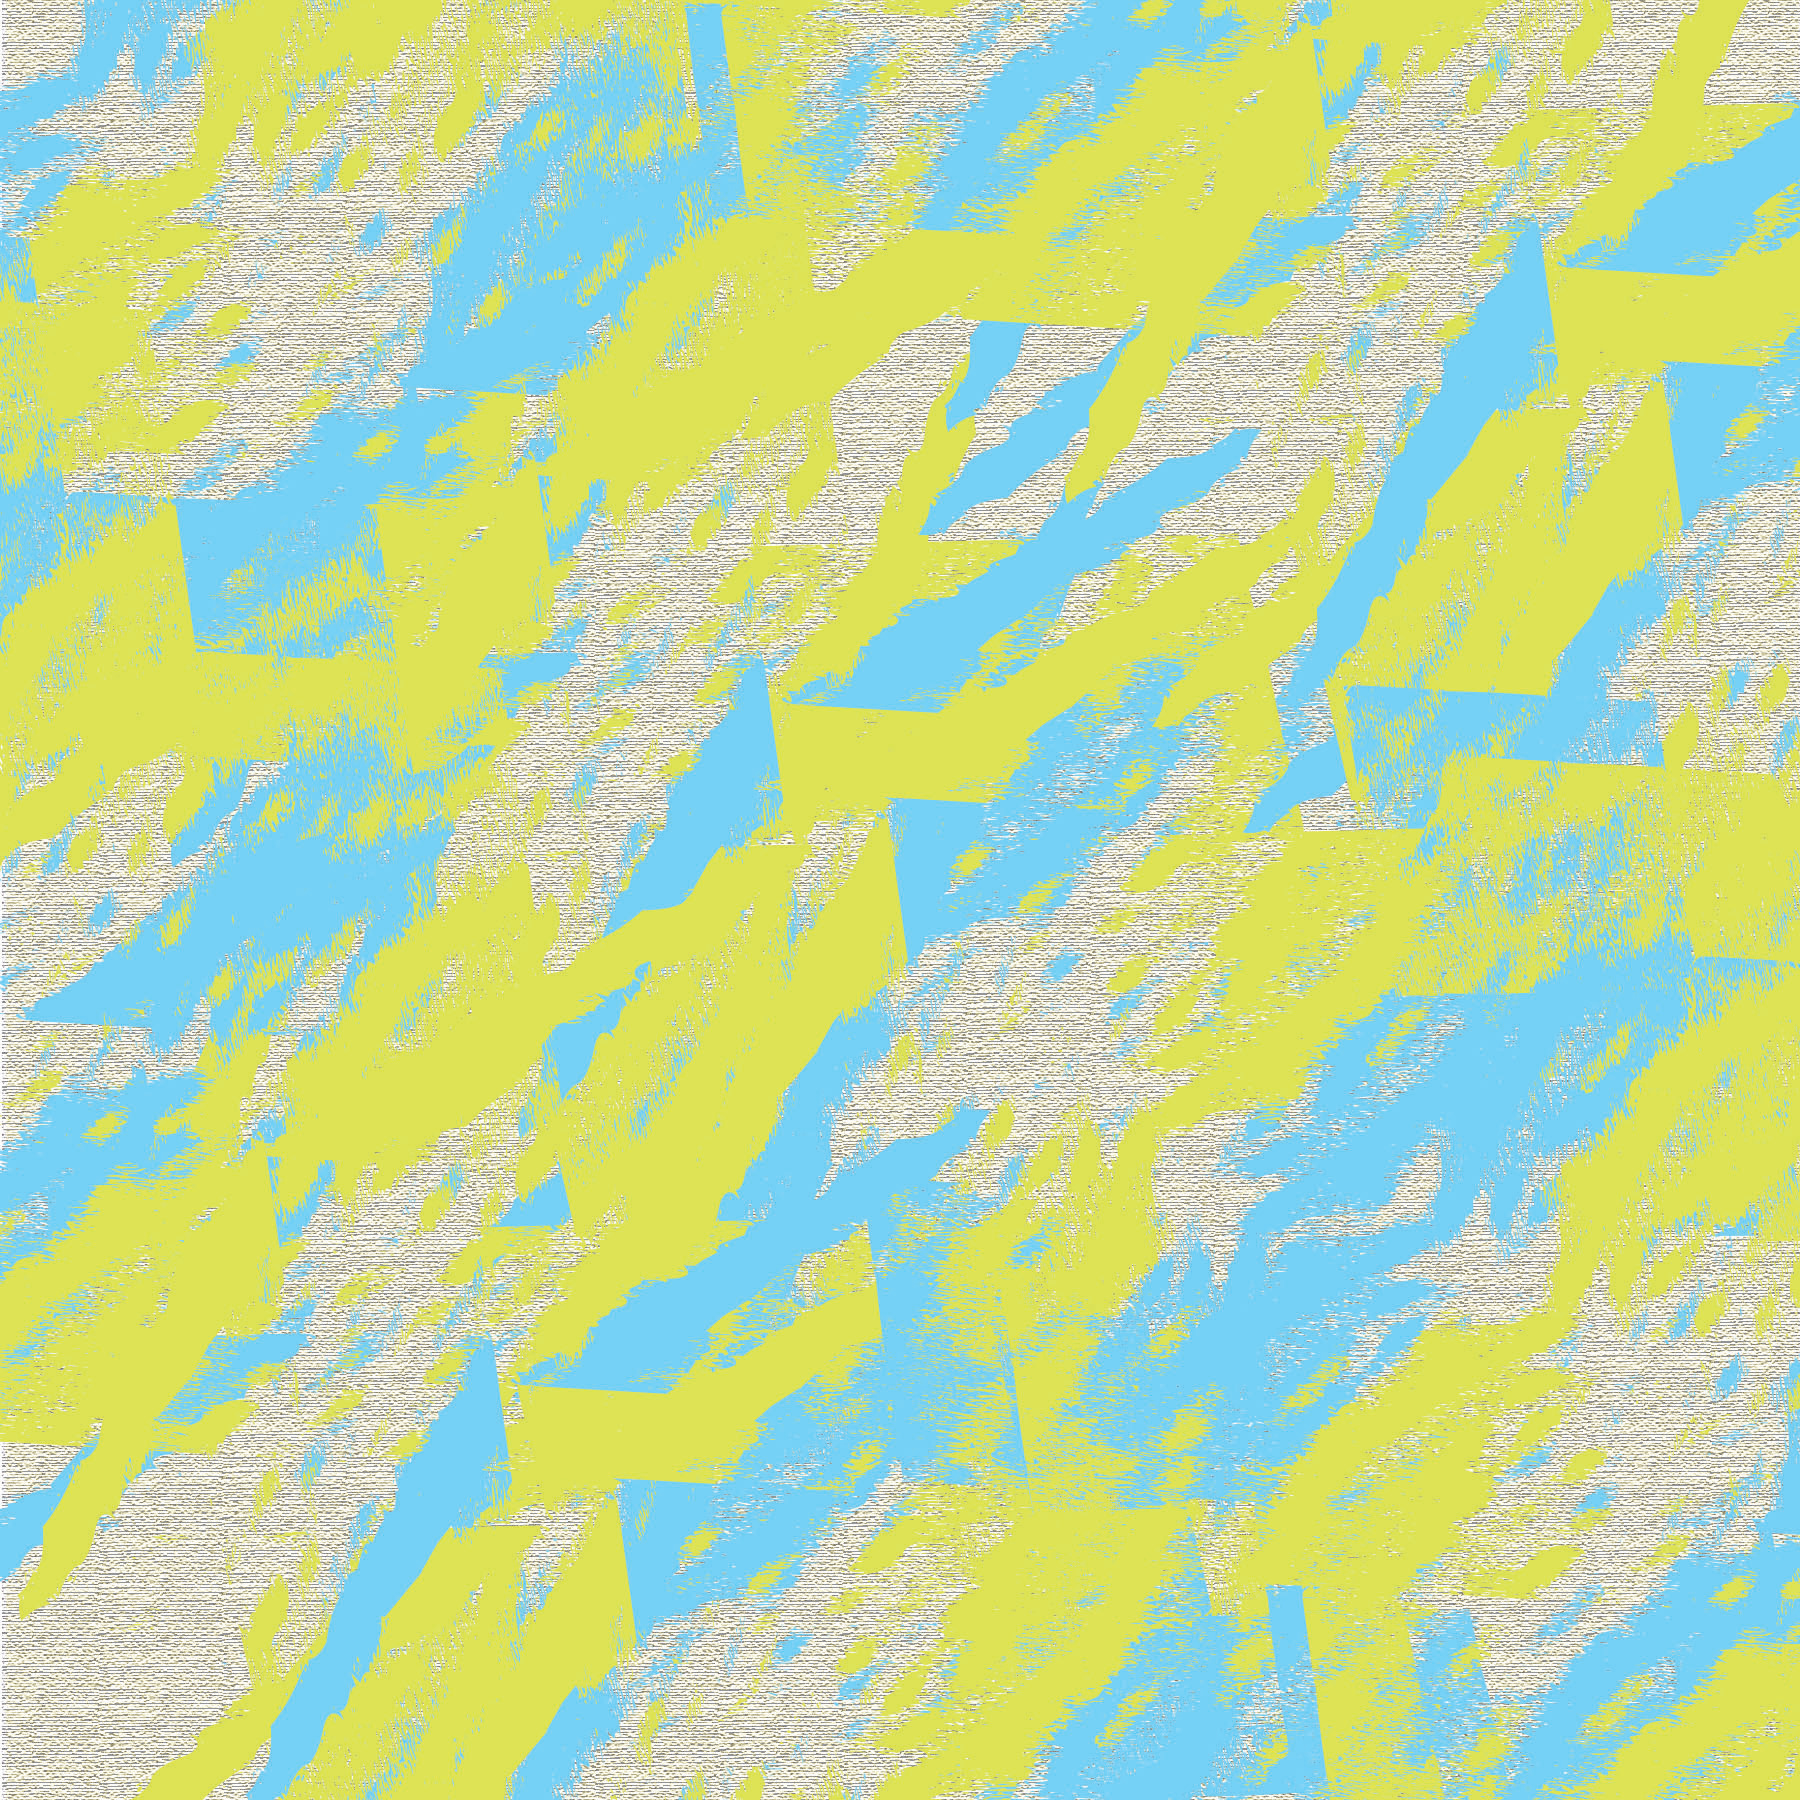 2017 yellow blue